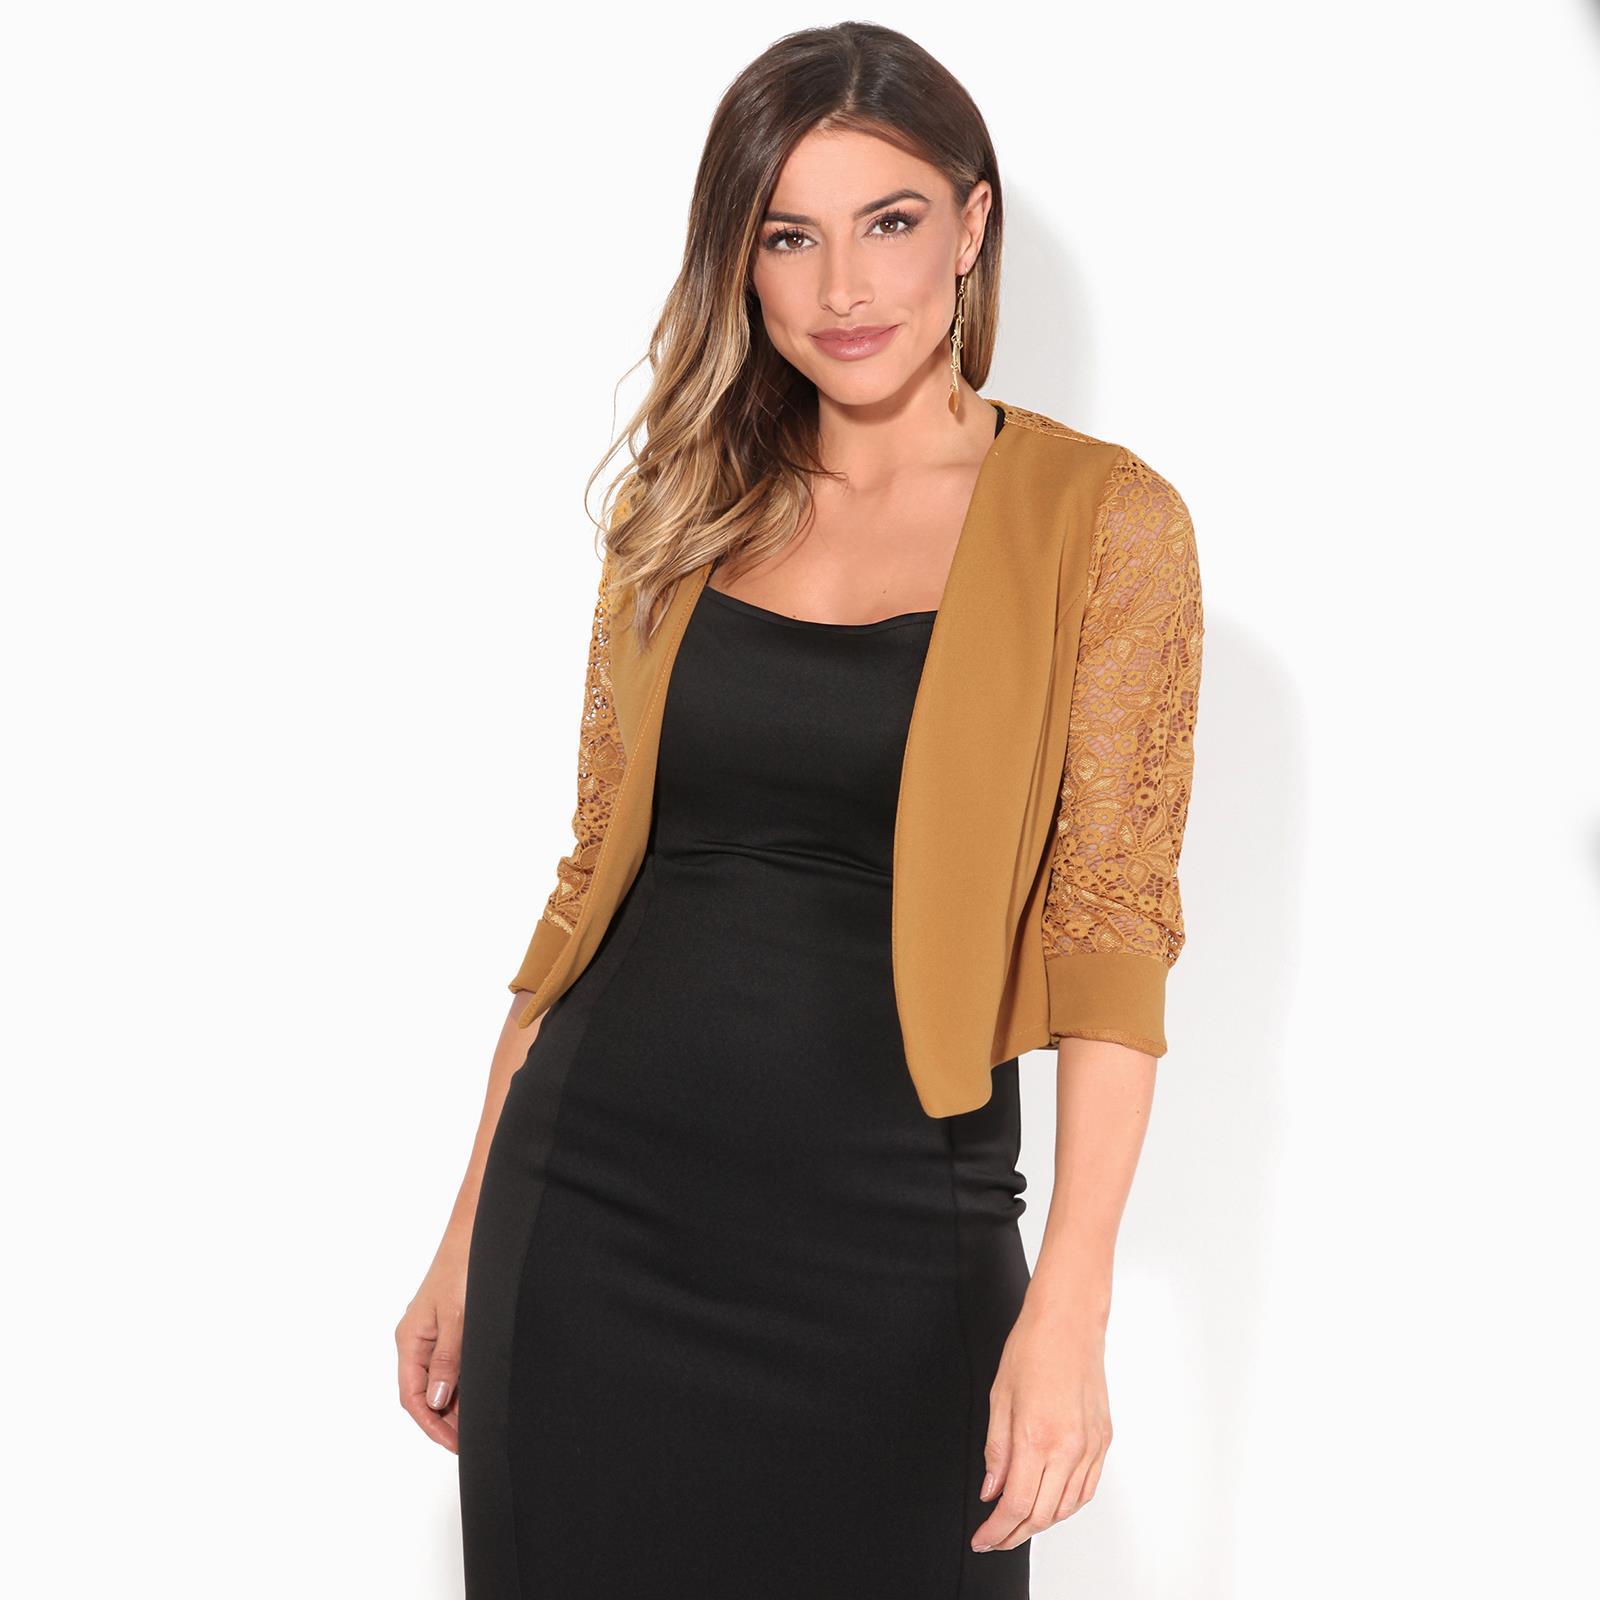 Womens-Ladies-Bolero-Lace-Shrug-Short-Sleeve-Cardigan-Cropped-Party-Top-Jacket thumbnail 10